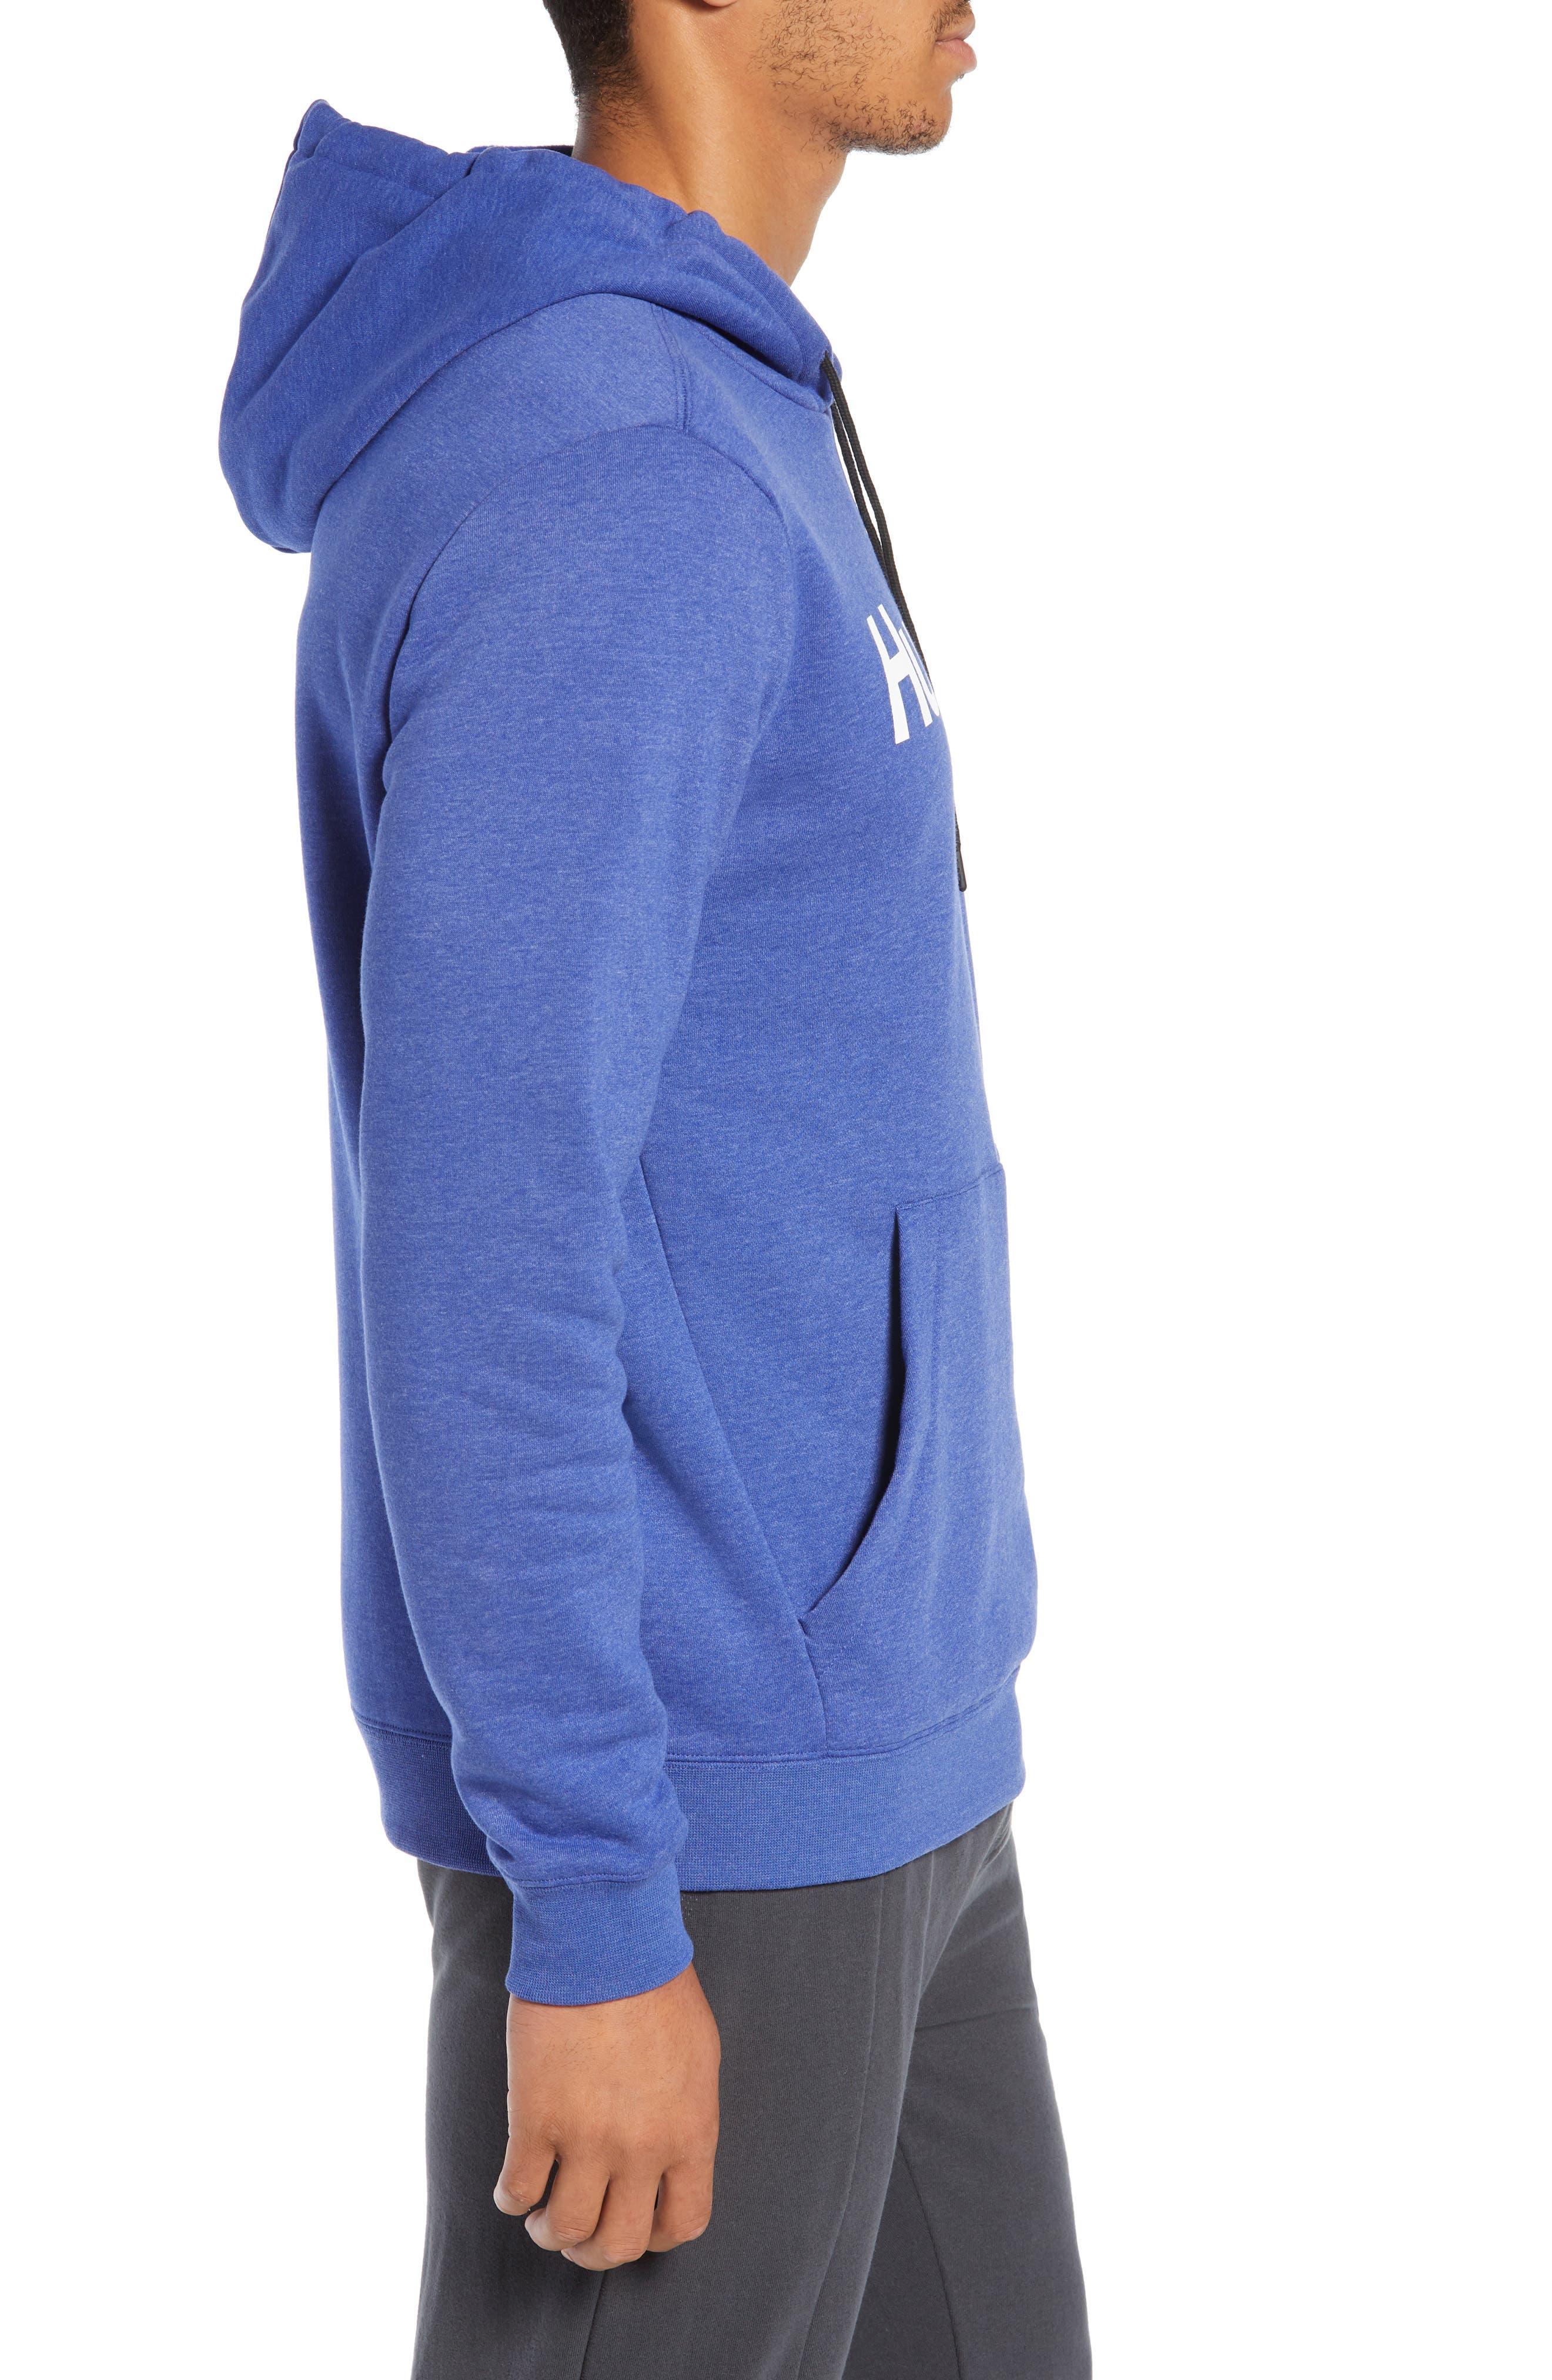 Surf Check Hoodie Sweatshirt,                             Alternate thumbnail 3, color,                             DEEP ROYAL HEATHER/ WHITE